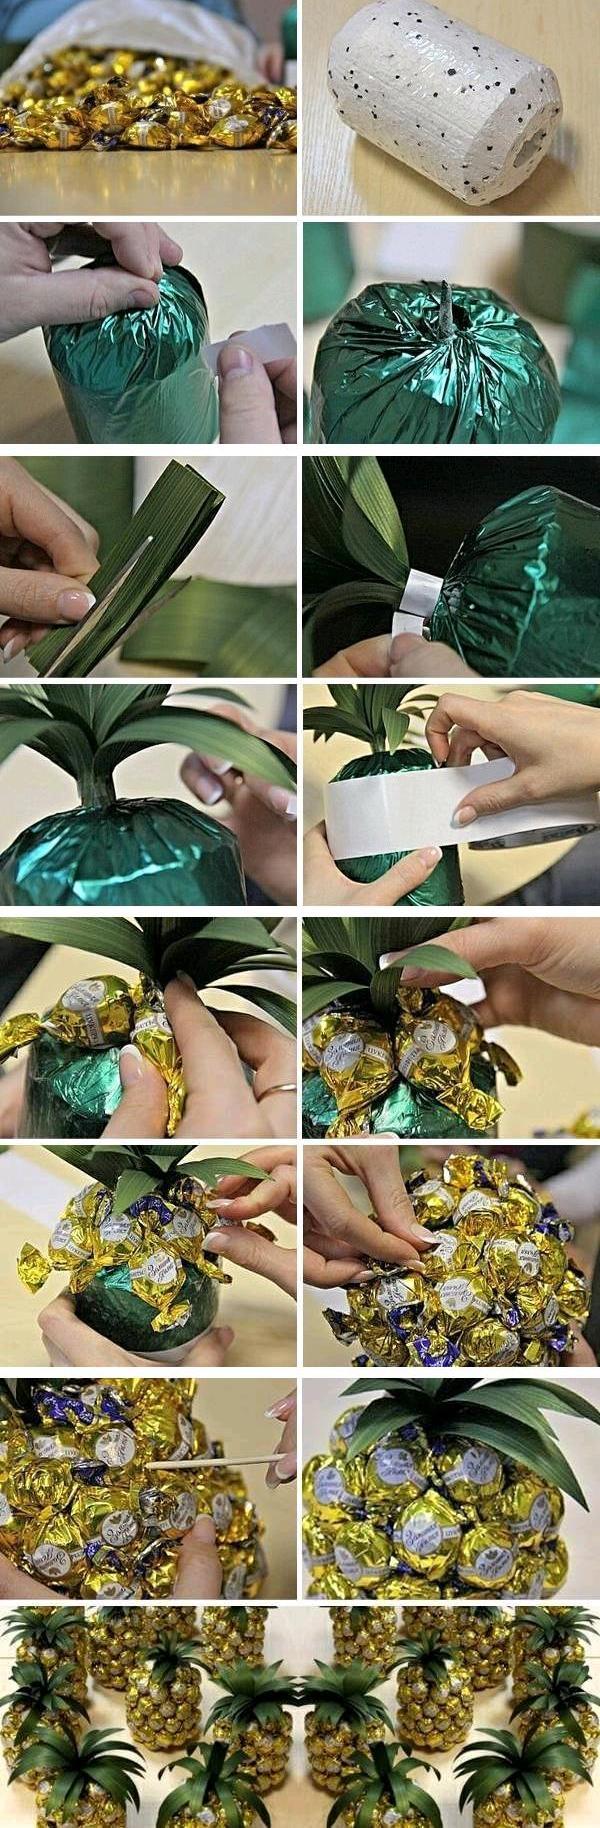 Creative gift wrap ideas wine bottle chocolates pineapple look